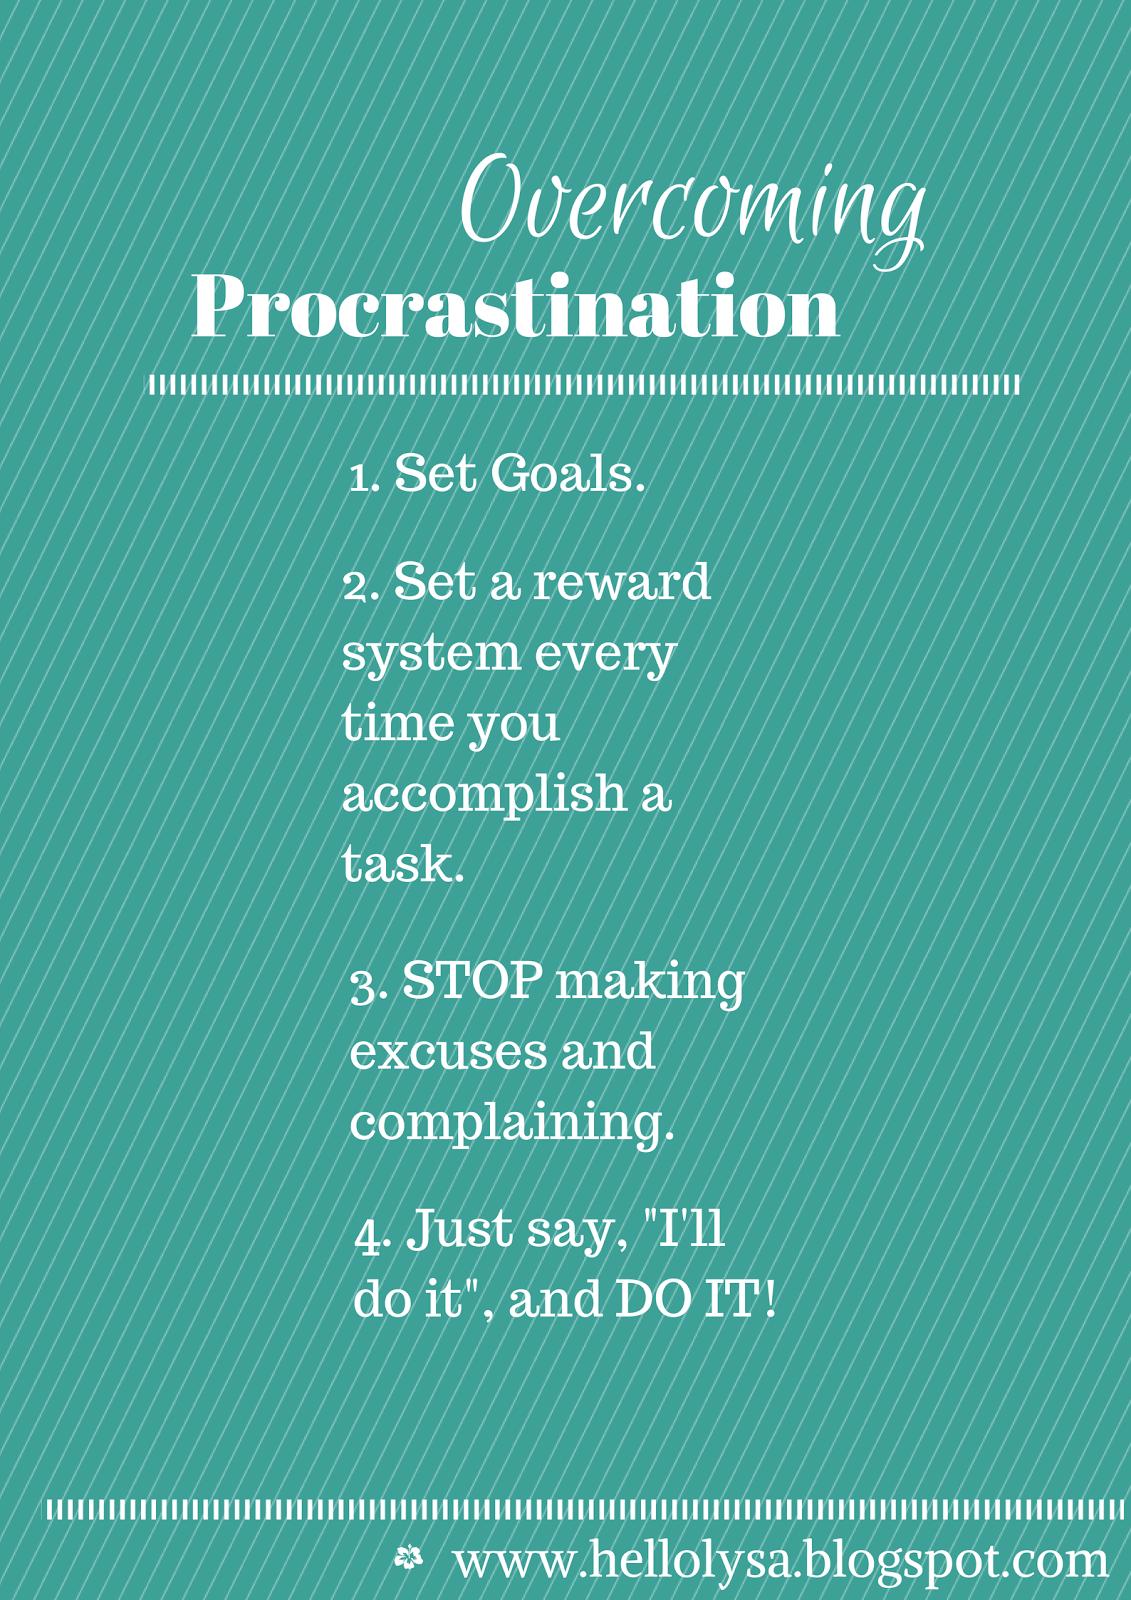 Overcoming Procrastination.